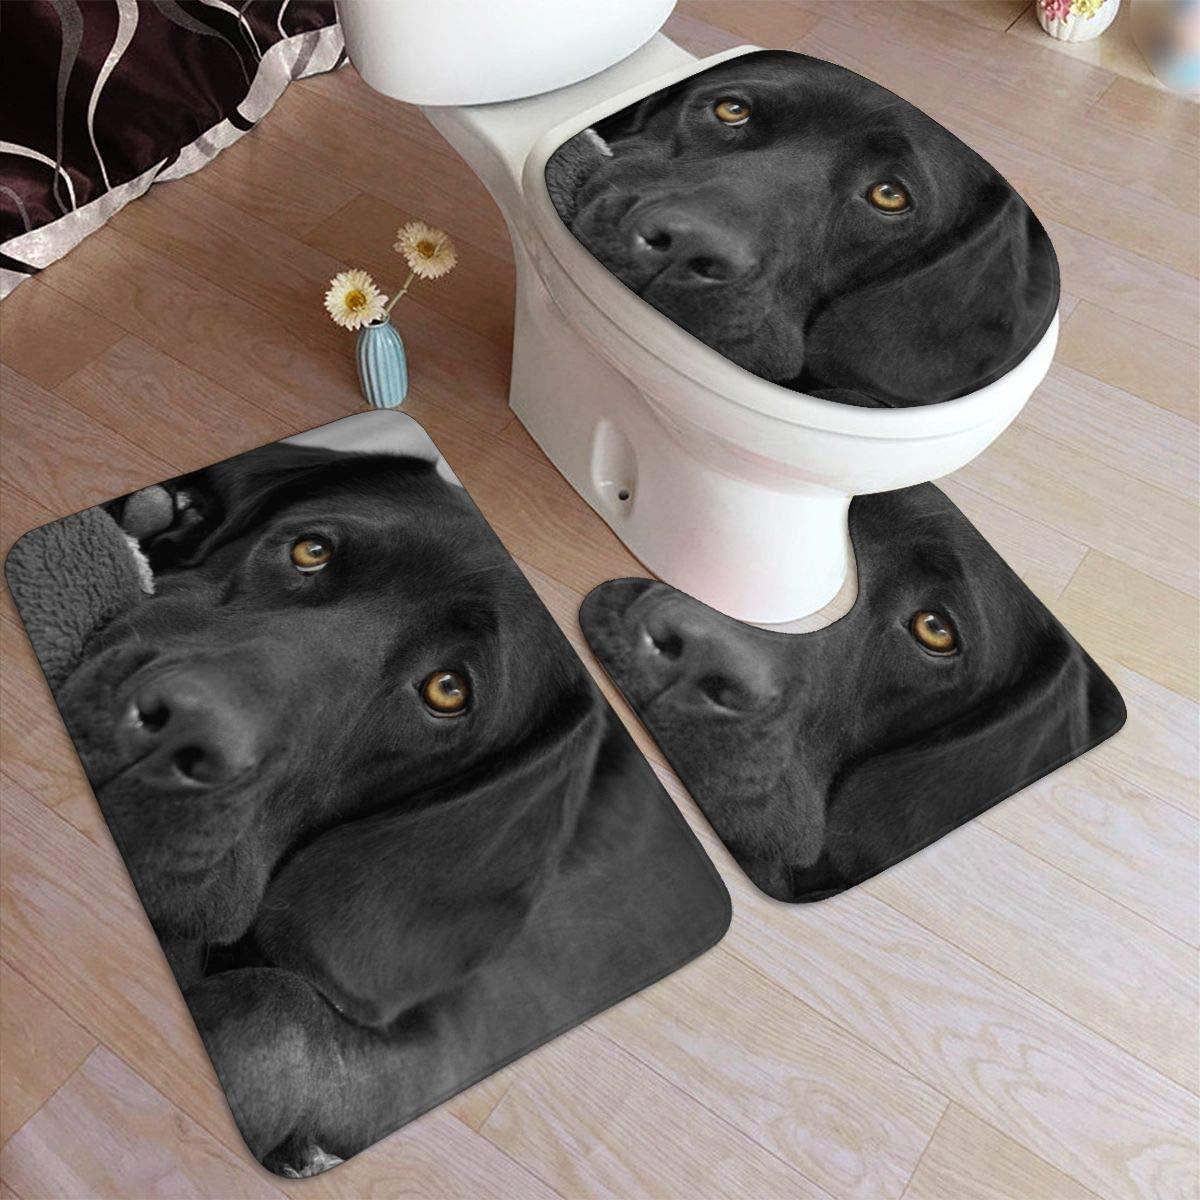 Bath Mat Sets, Black Dog,Contour Rug U-Shaped Toilet Lid Cover,Non Slip,Machine Washable,3-Piece Rug Set Easier to Dry for Bathroom